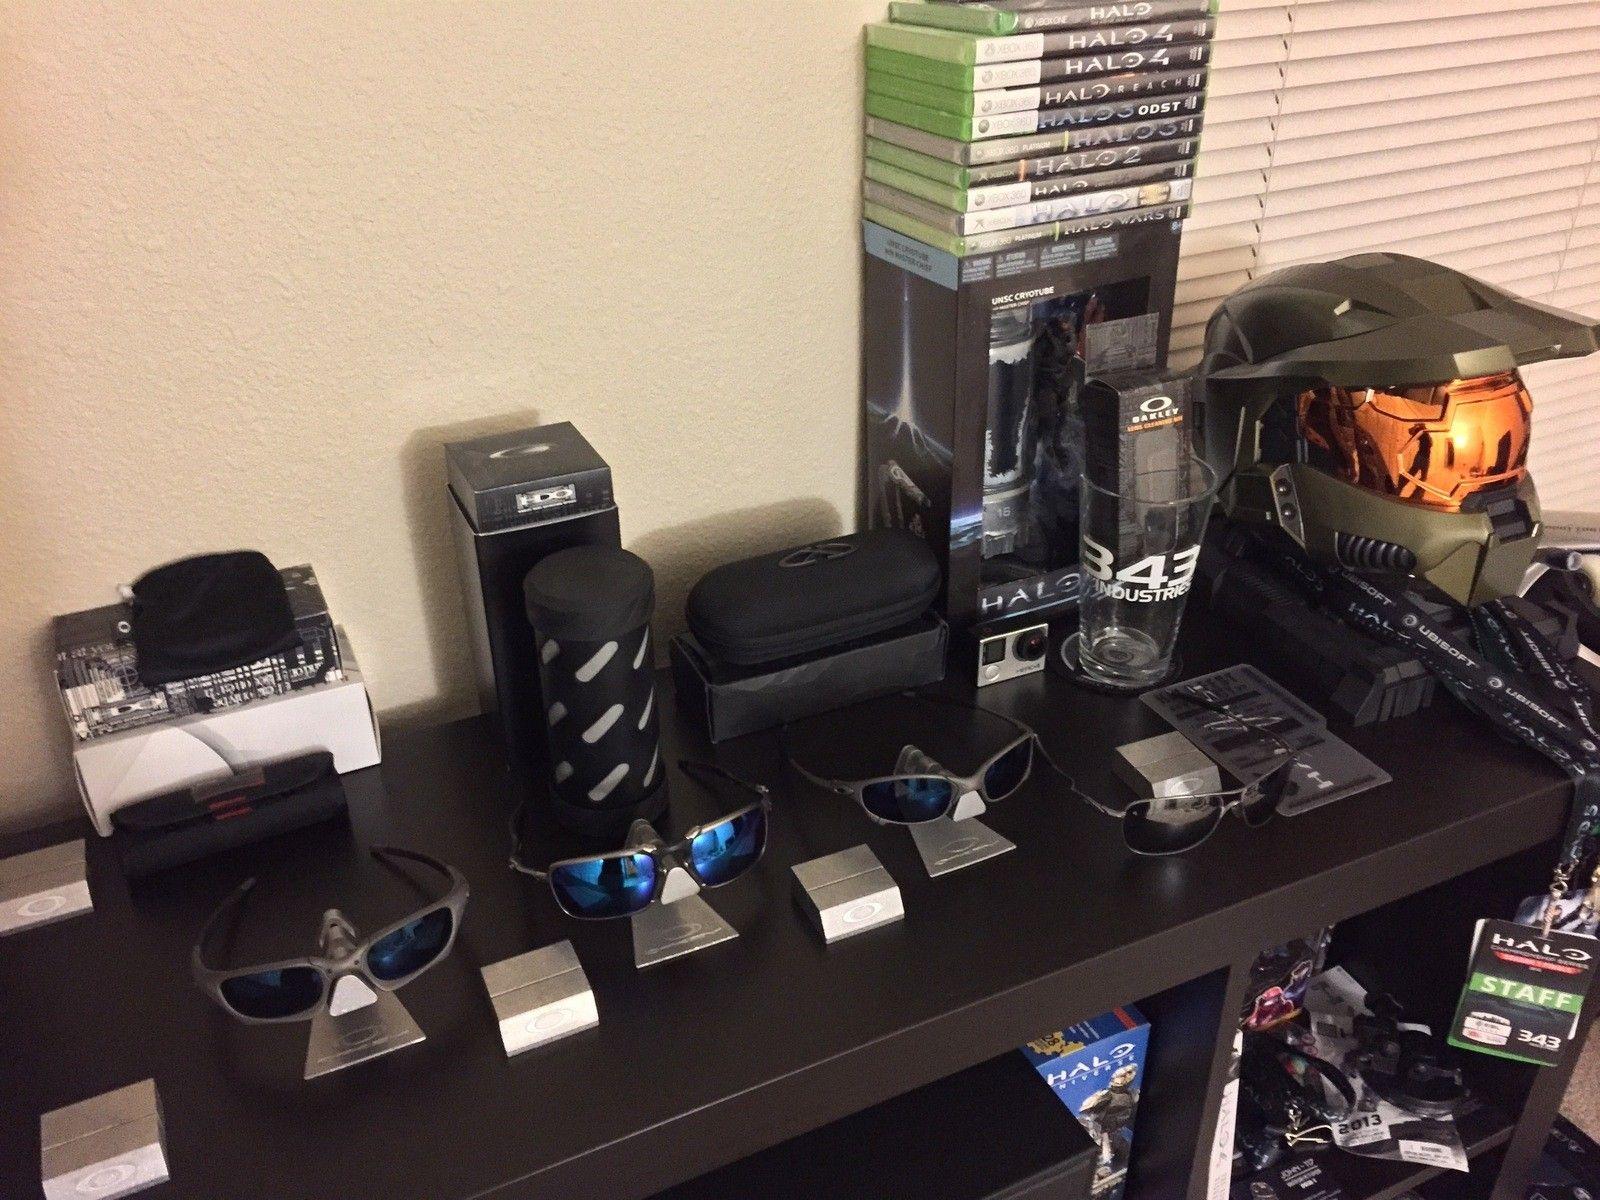 My Collection So Far - 1.JPG